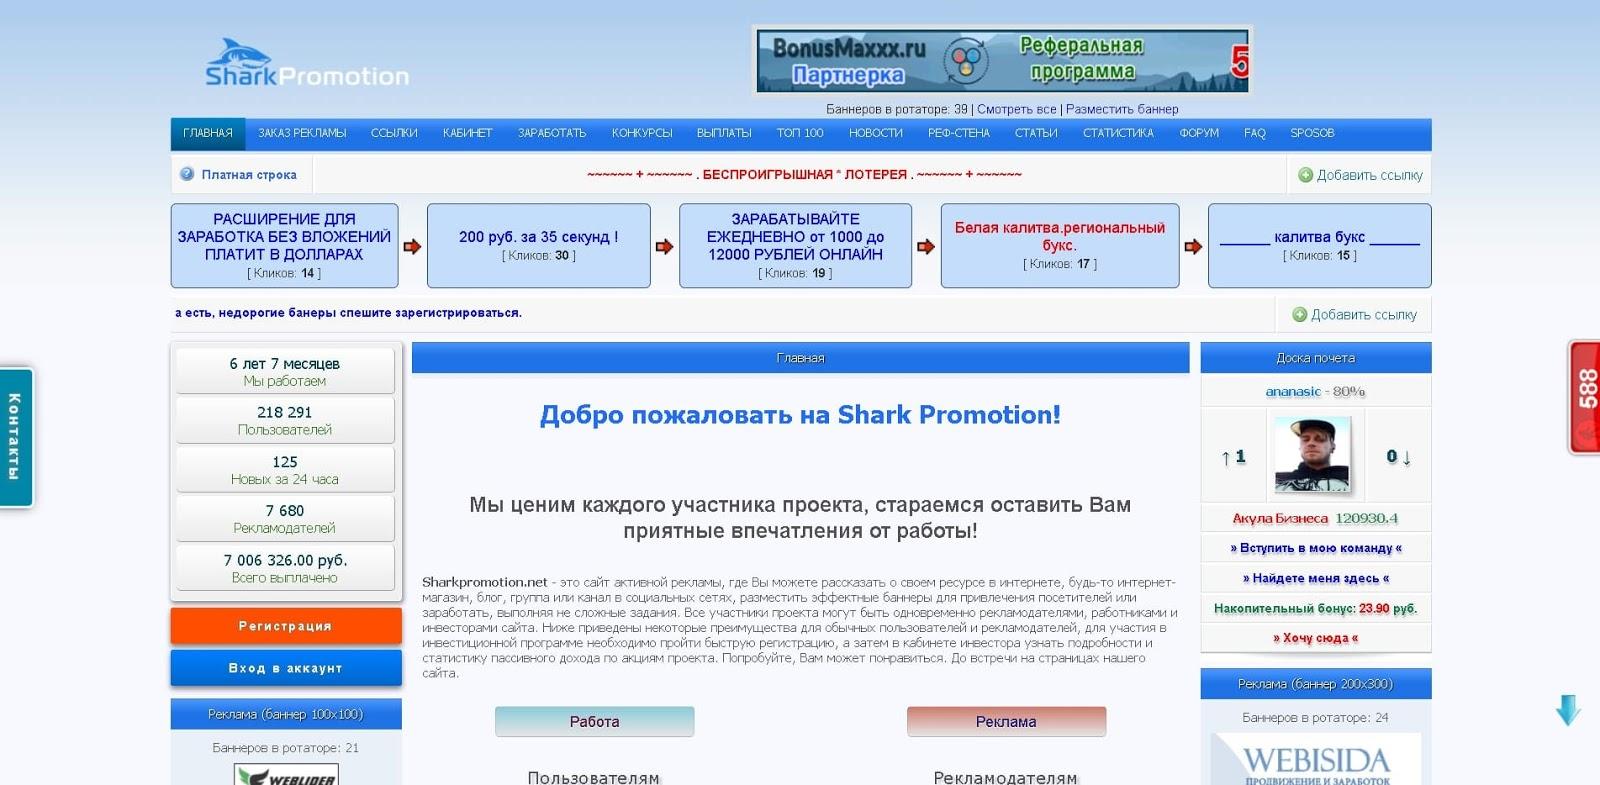 sharkpromotion-glavnaya-stranicza